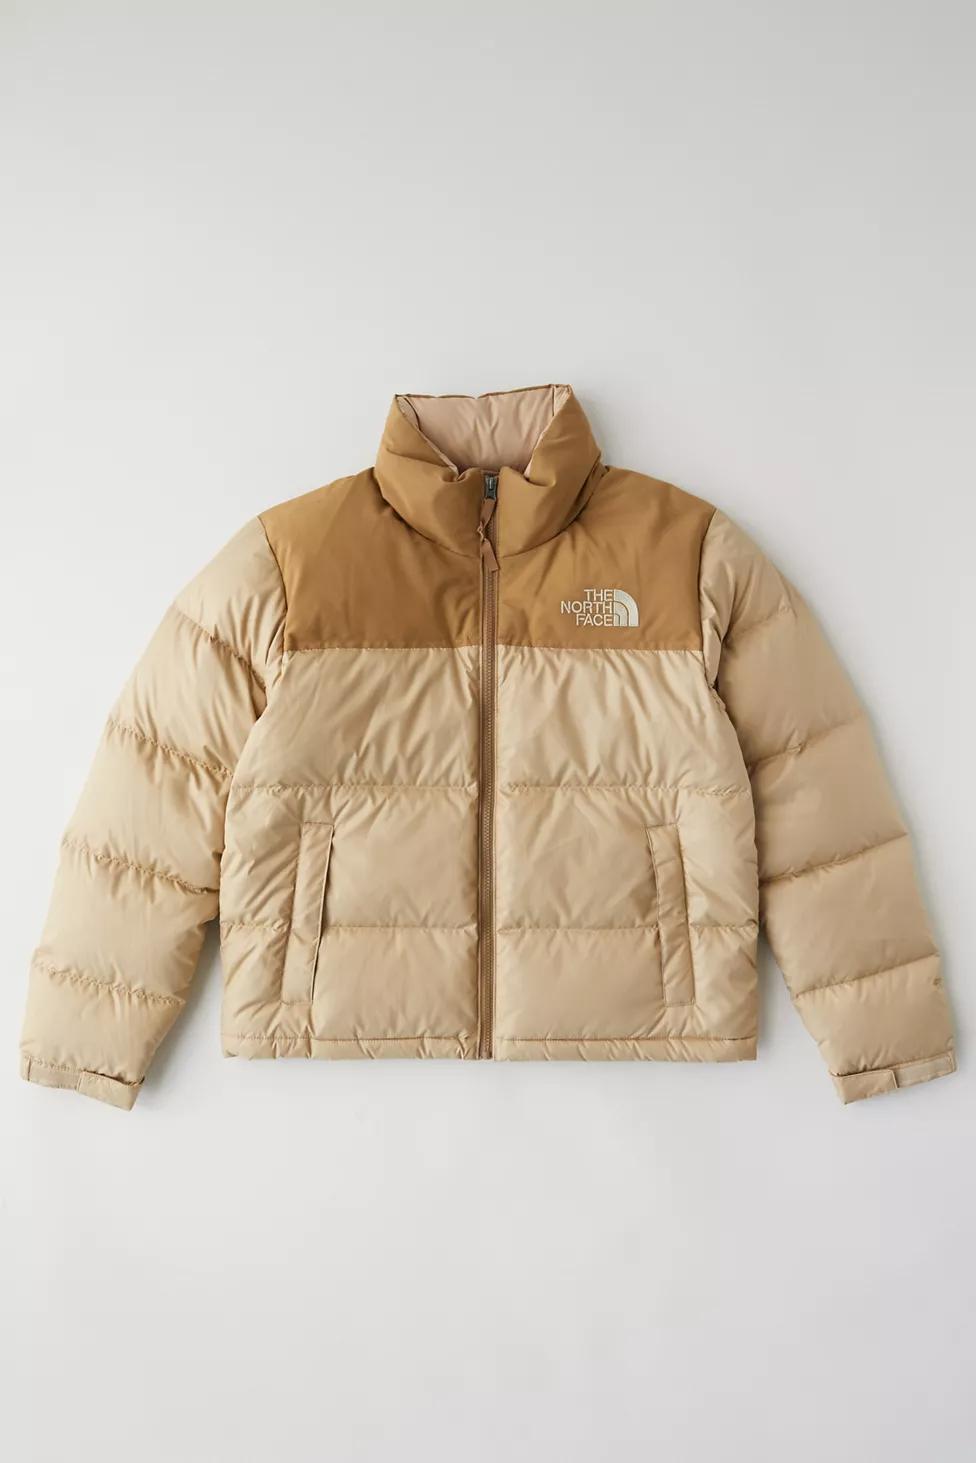 The North Face Eco Nuptse Puffer Jacket Retro Jacket Puffer Jackets The North Face [ 1463 x 976 Pixel ]